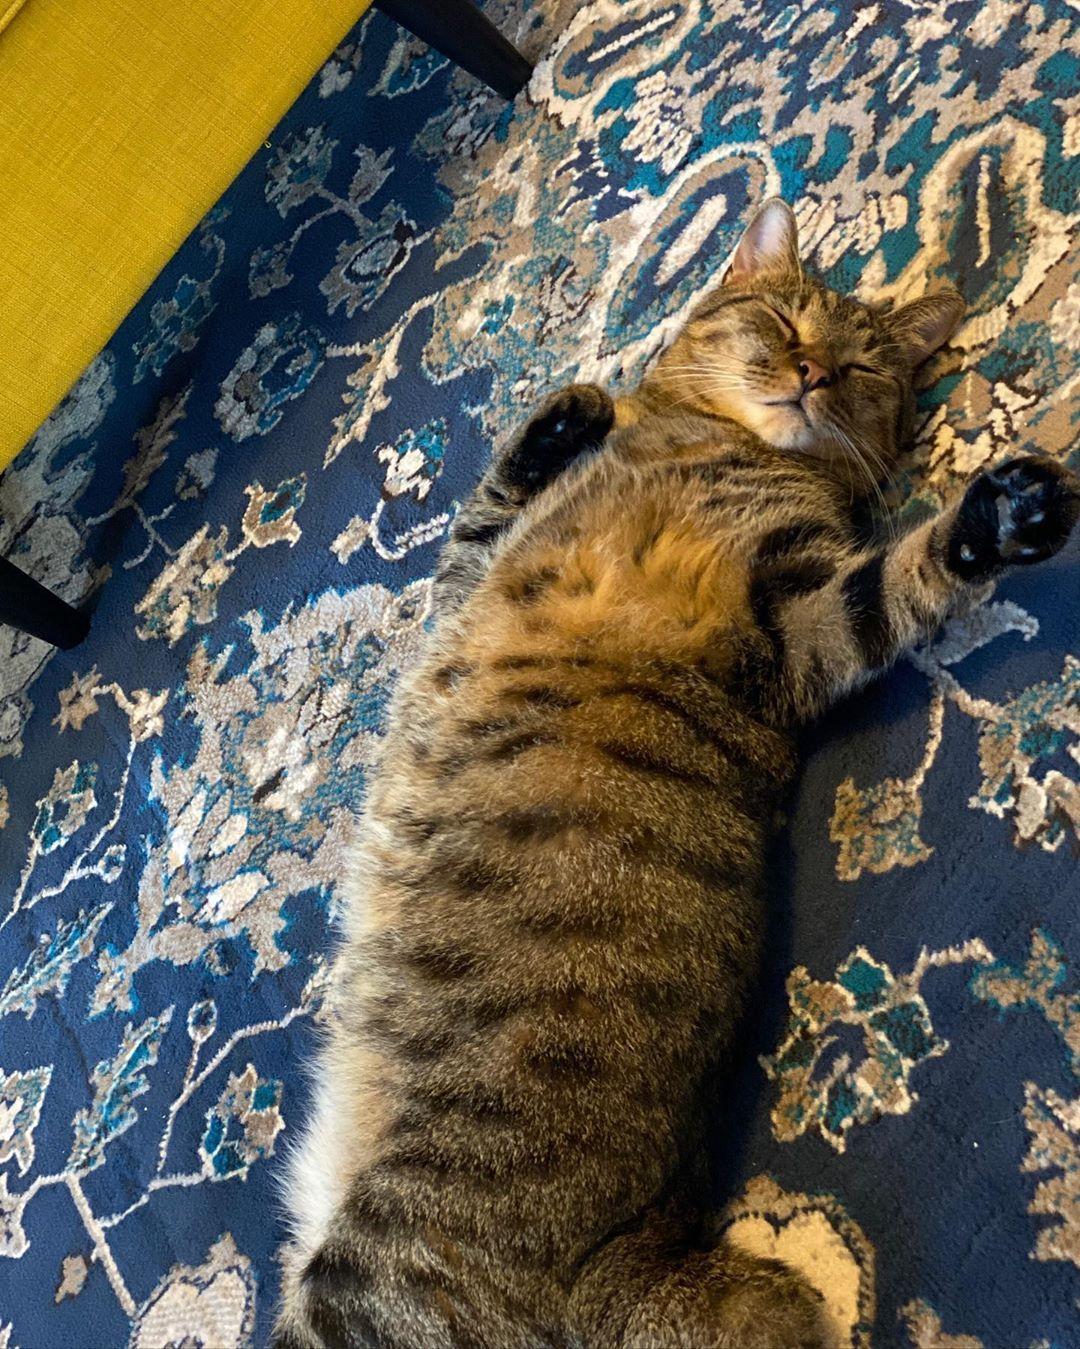 Time for a nappy nap. #cat #kitten #specialneedspet #cute #meow #animals #florida #tabby #catloversclub #thedodo #dailyfluff #catpic #igcats #buzzfeedcats #cats #catlovers #pet #pets #love #catscatscats #catlife #cat #catsoftheday #catlove